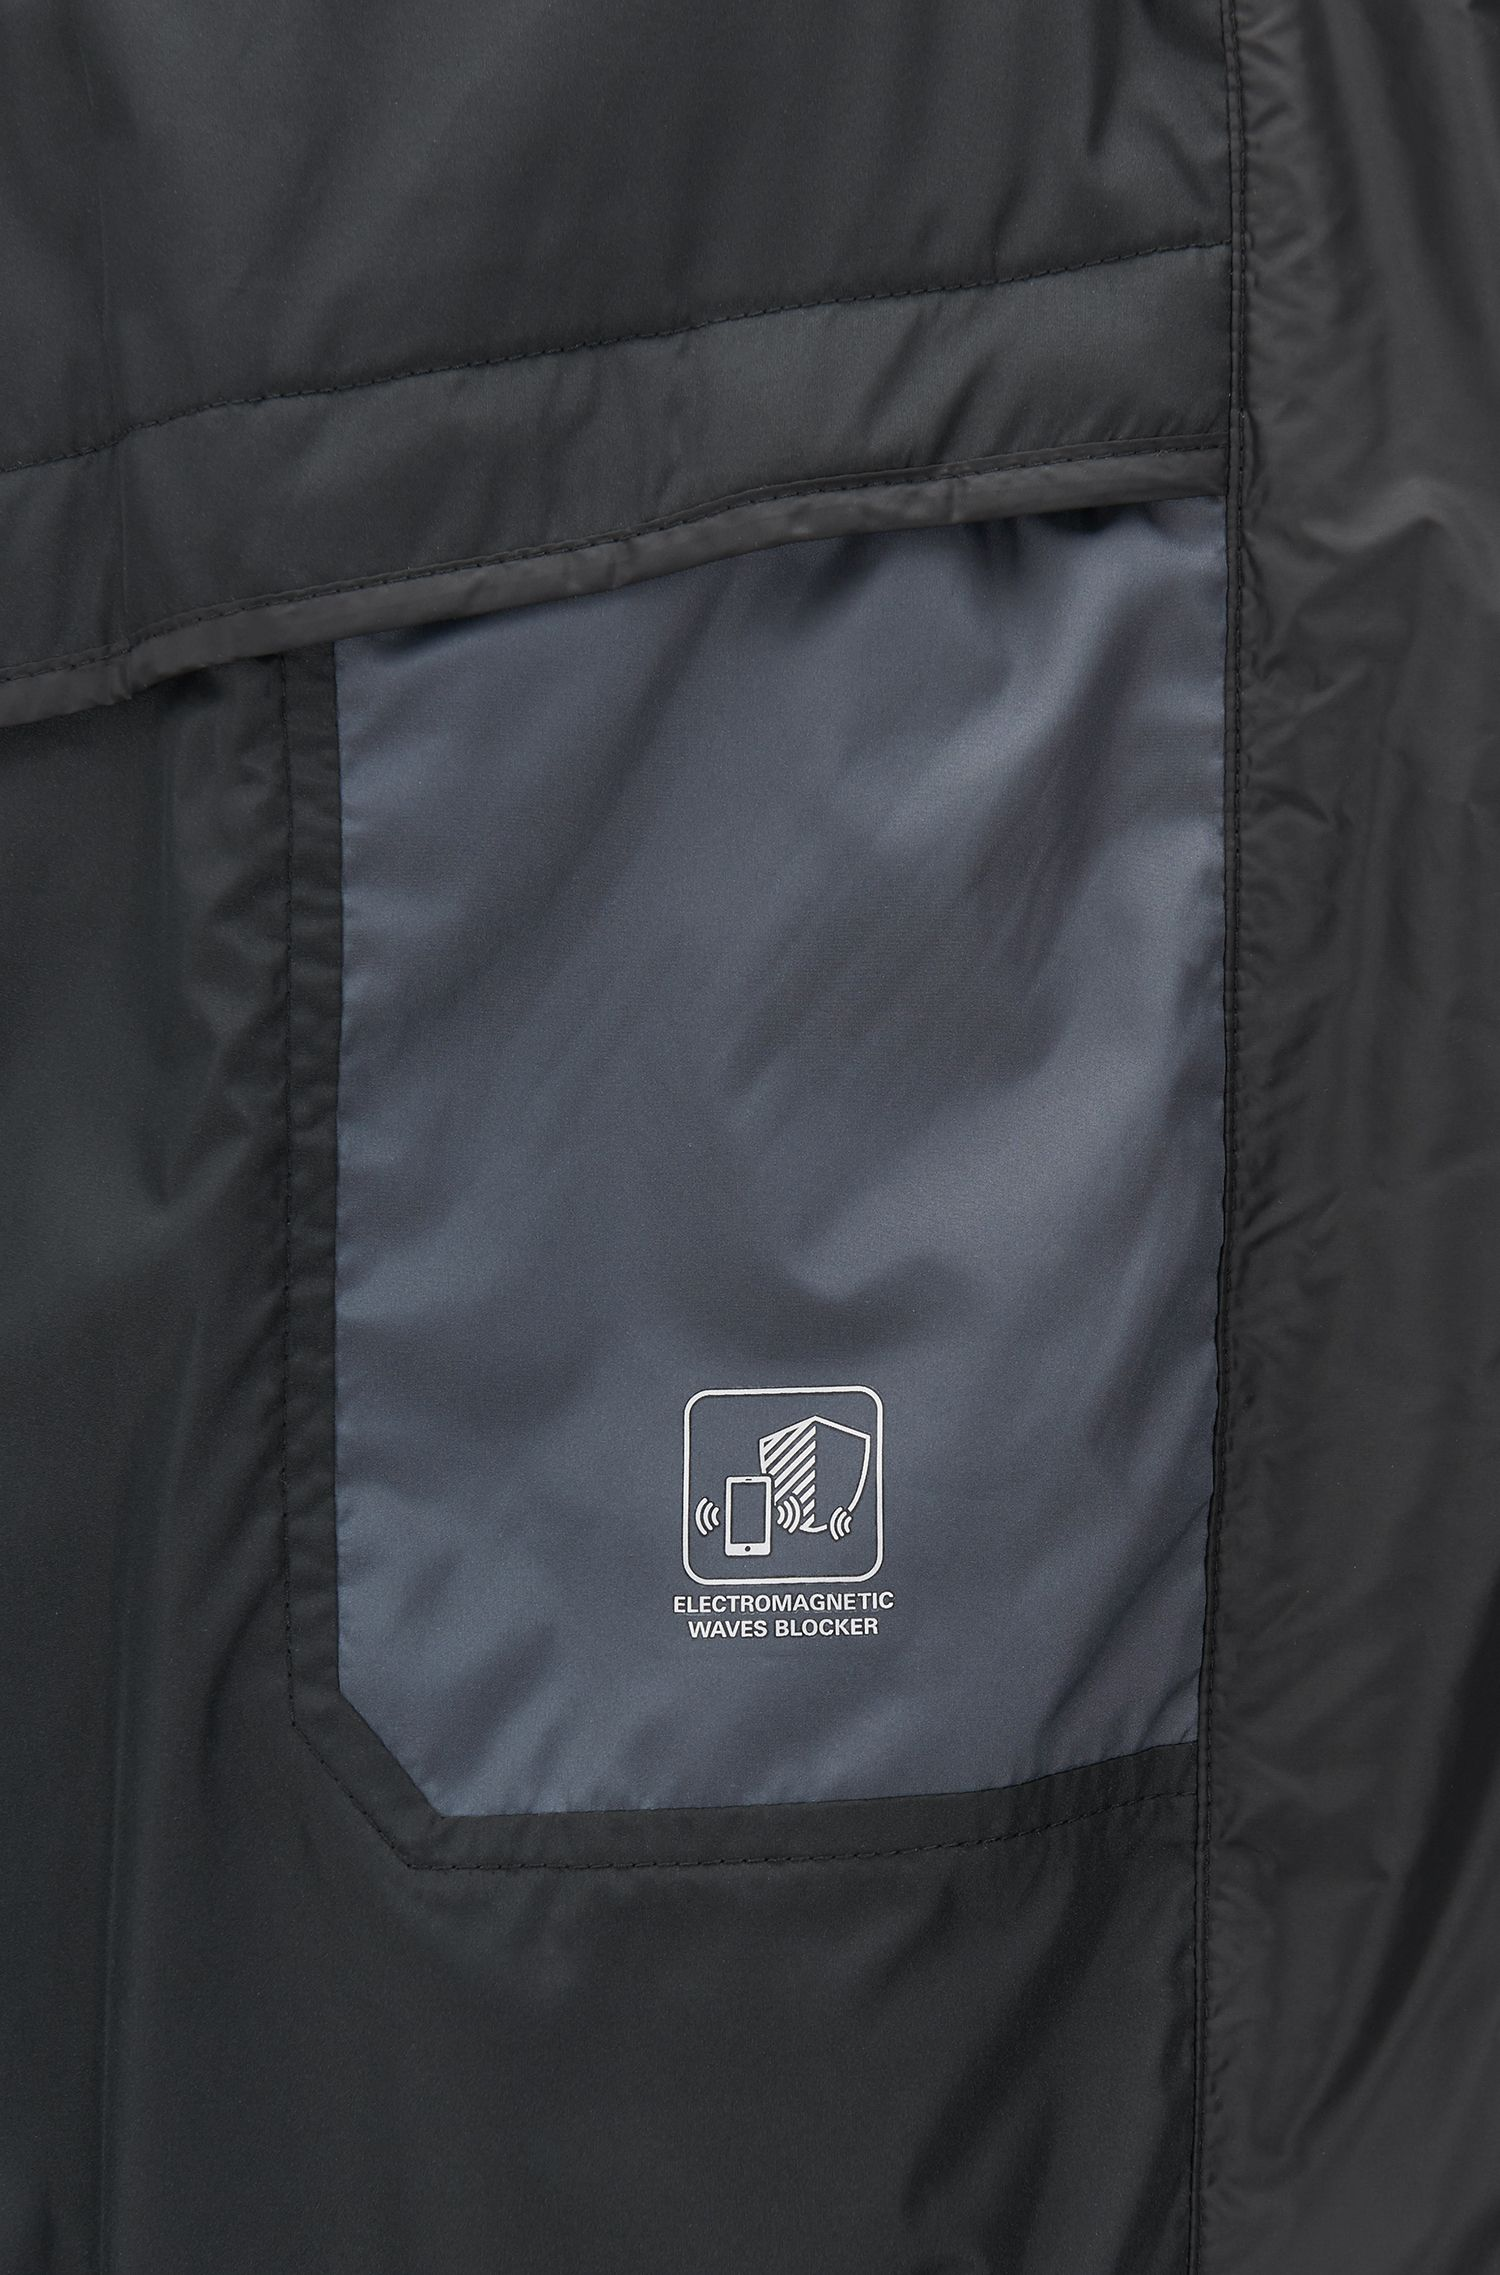 Hugo Boss - Water-repellent blouson jacket with electromagnetic-waves blocker - 6